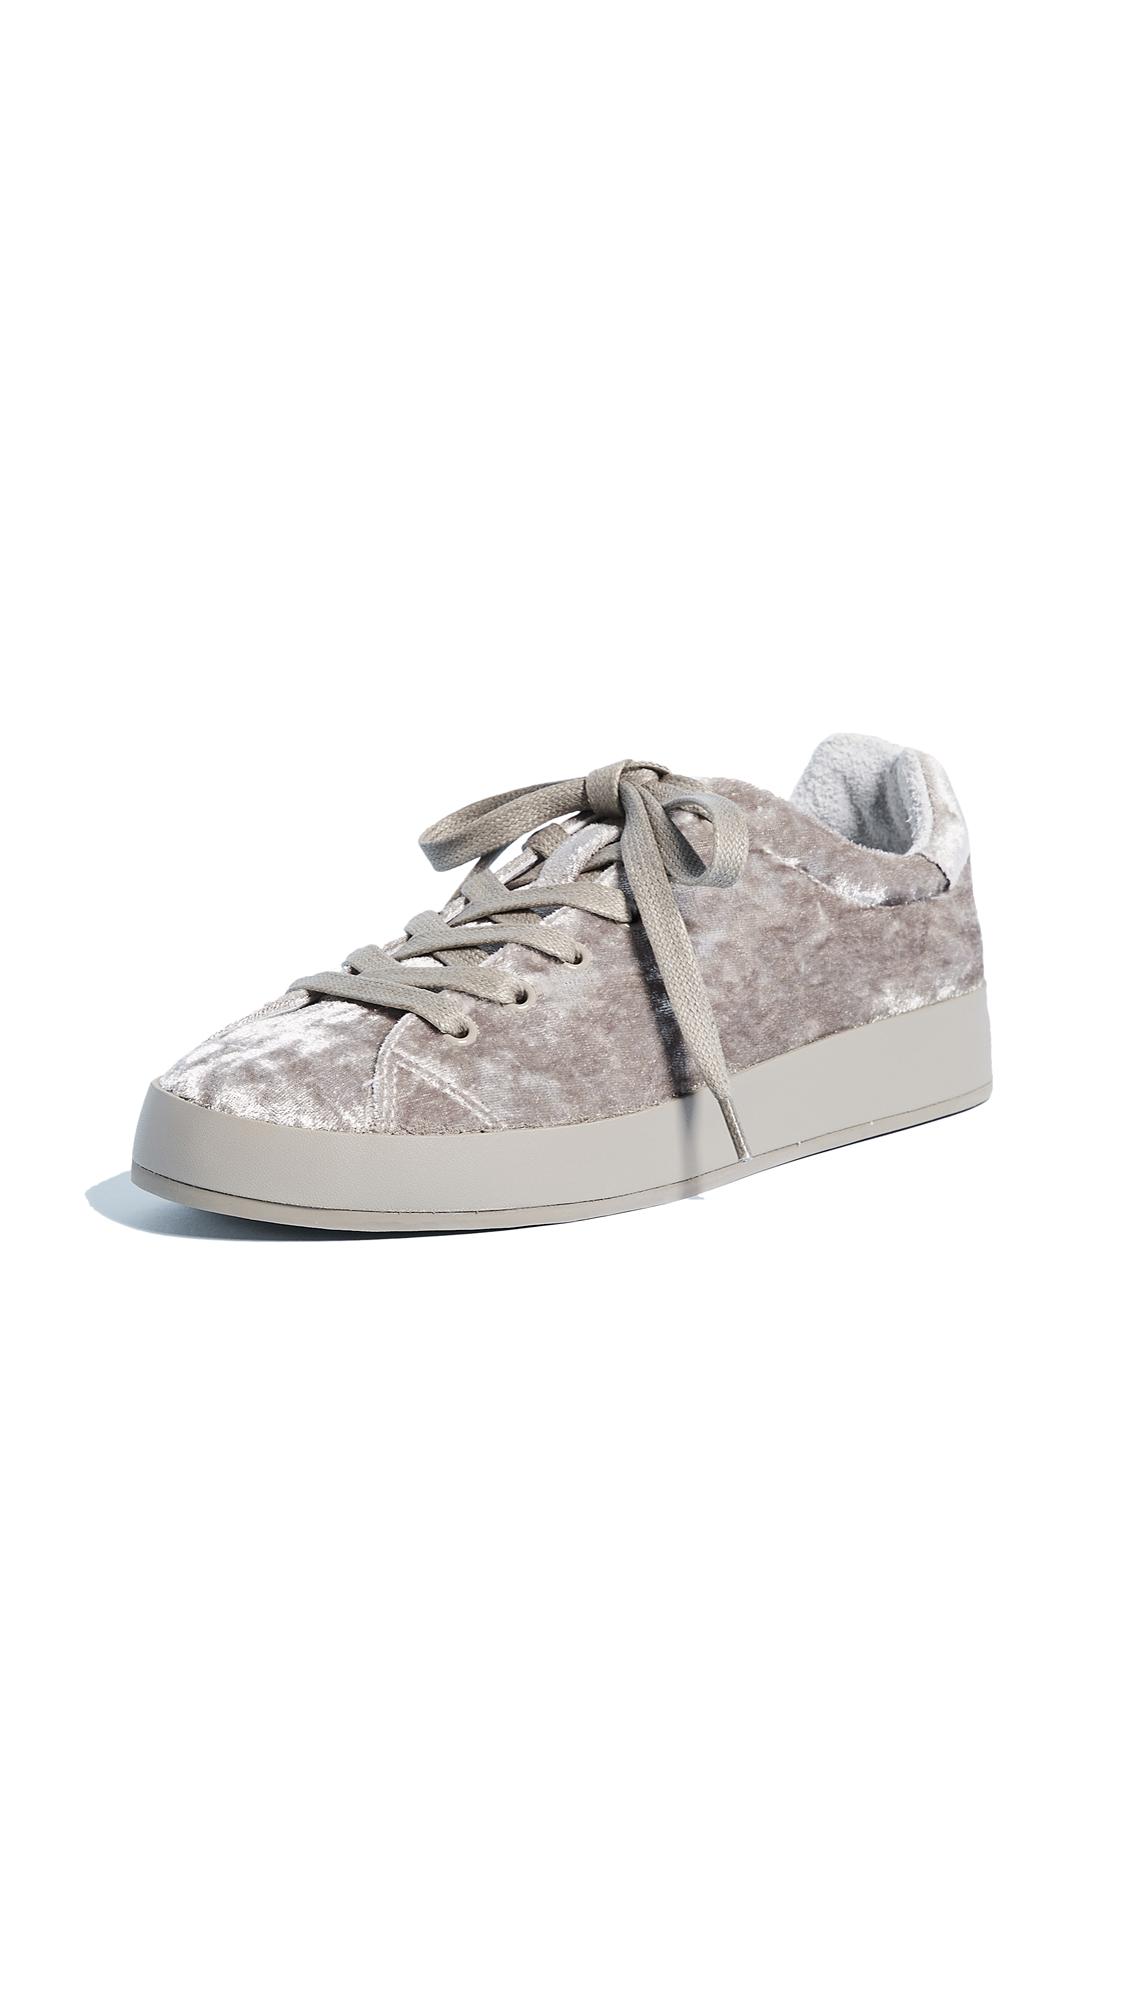 Rag & Bone RB1 Low Sneakers - Dove